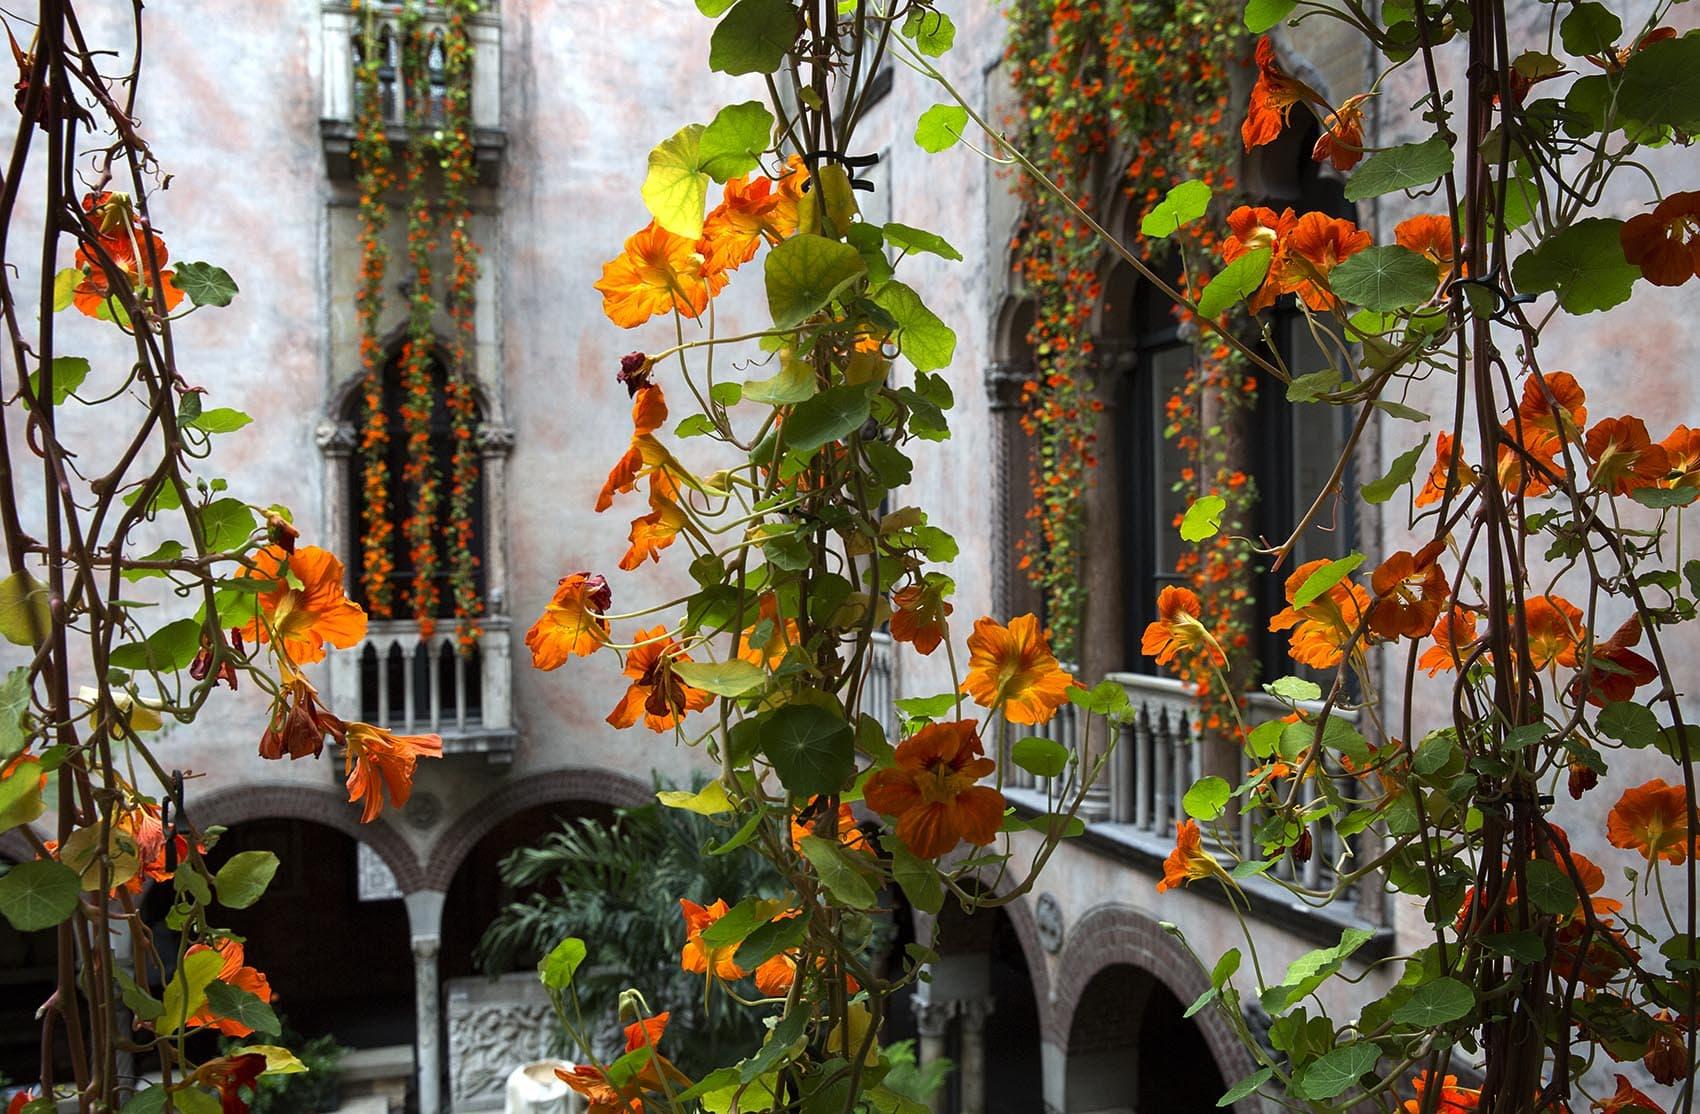 Nasturtiums hang in the courtyard at the Isabella Stewart Gardner Museum. (Robin Lubbock/WBUR)